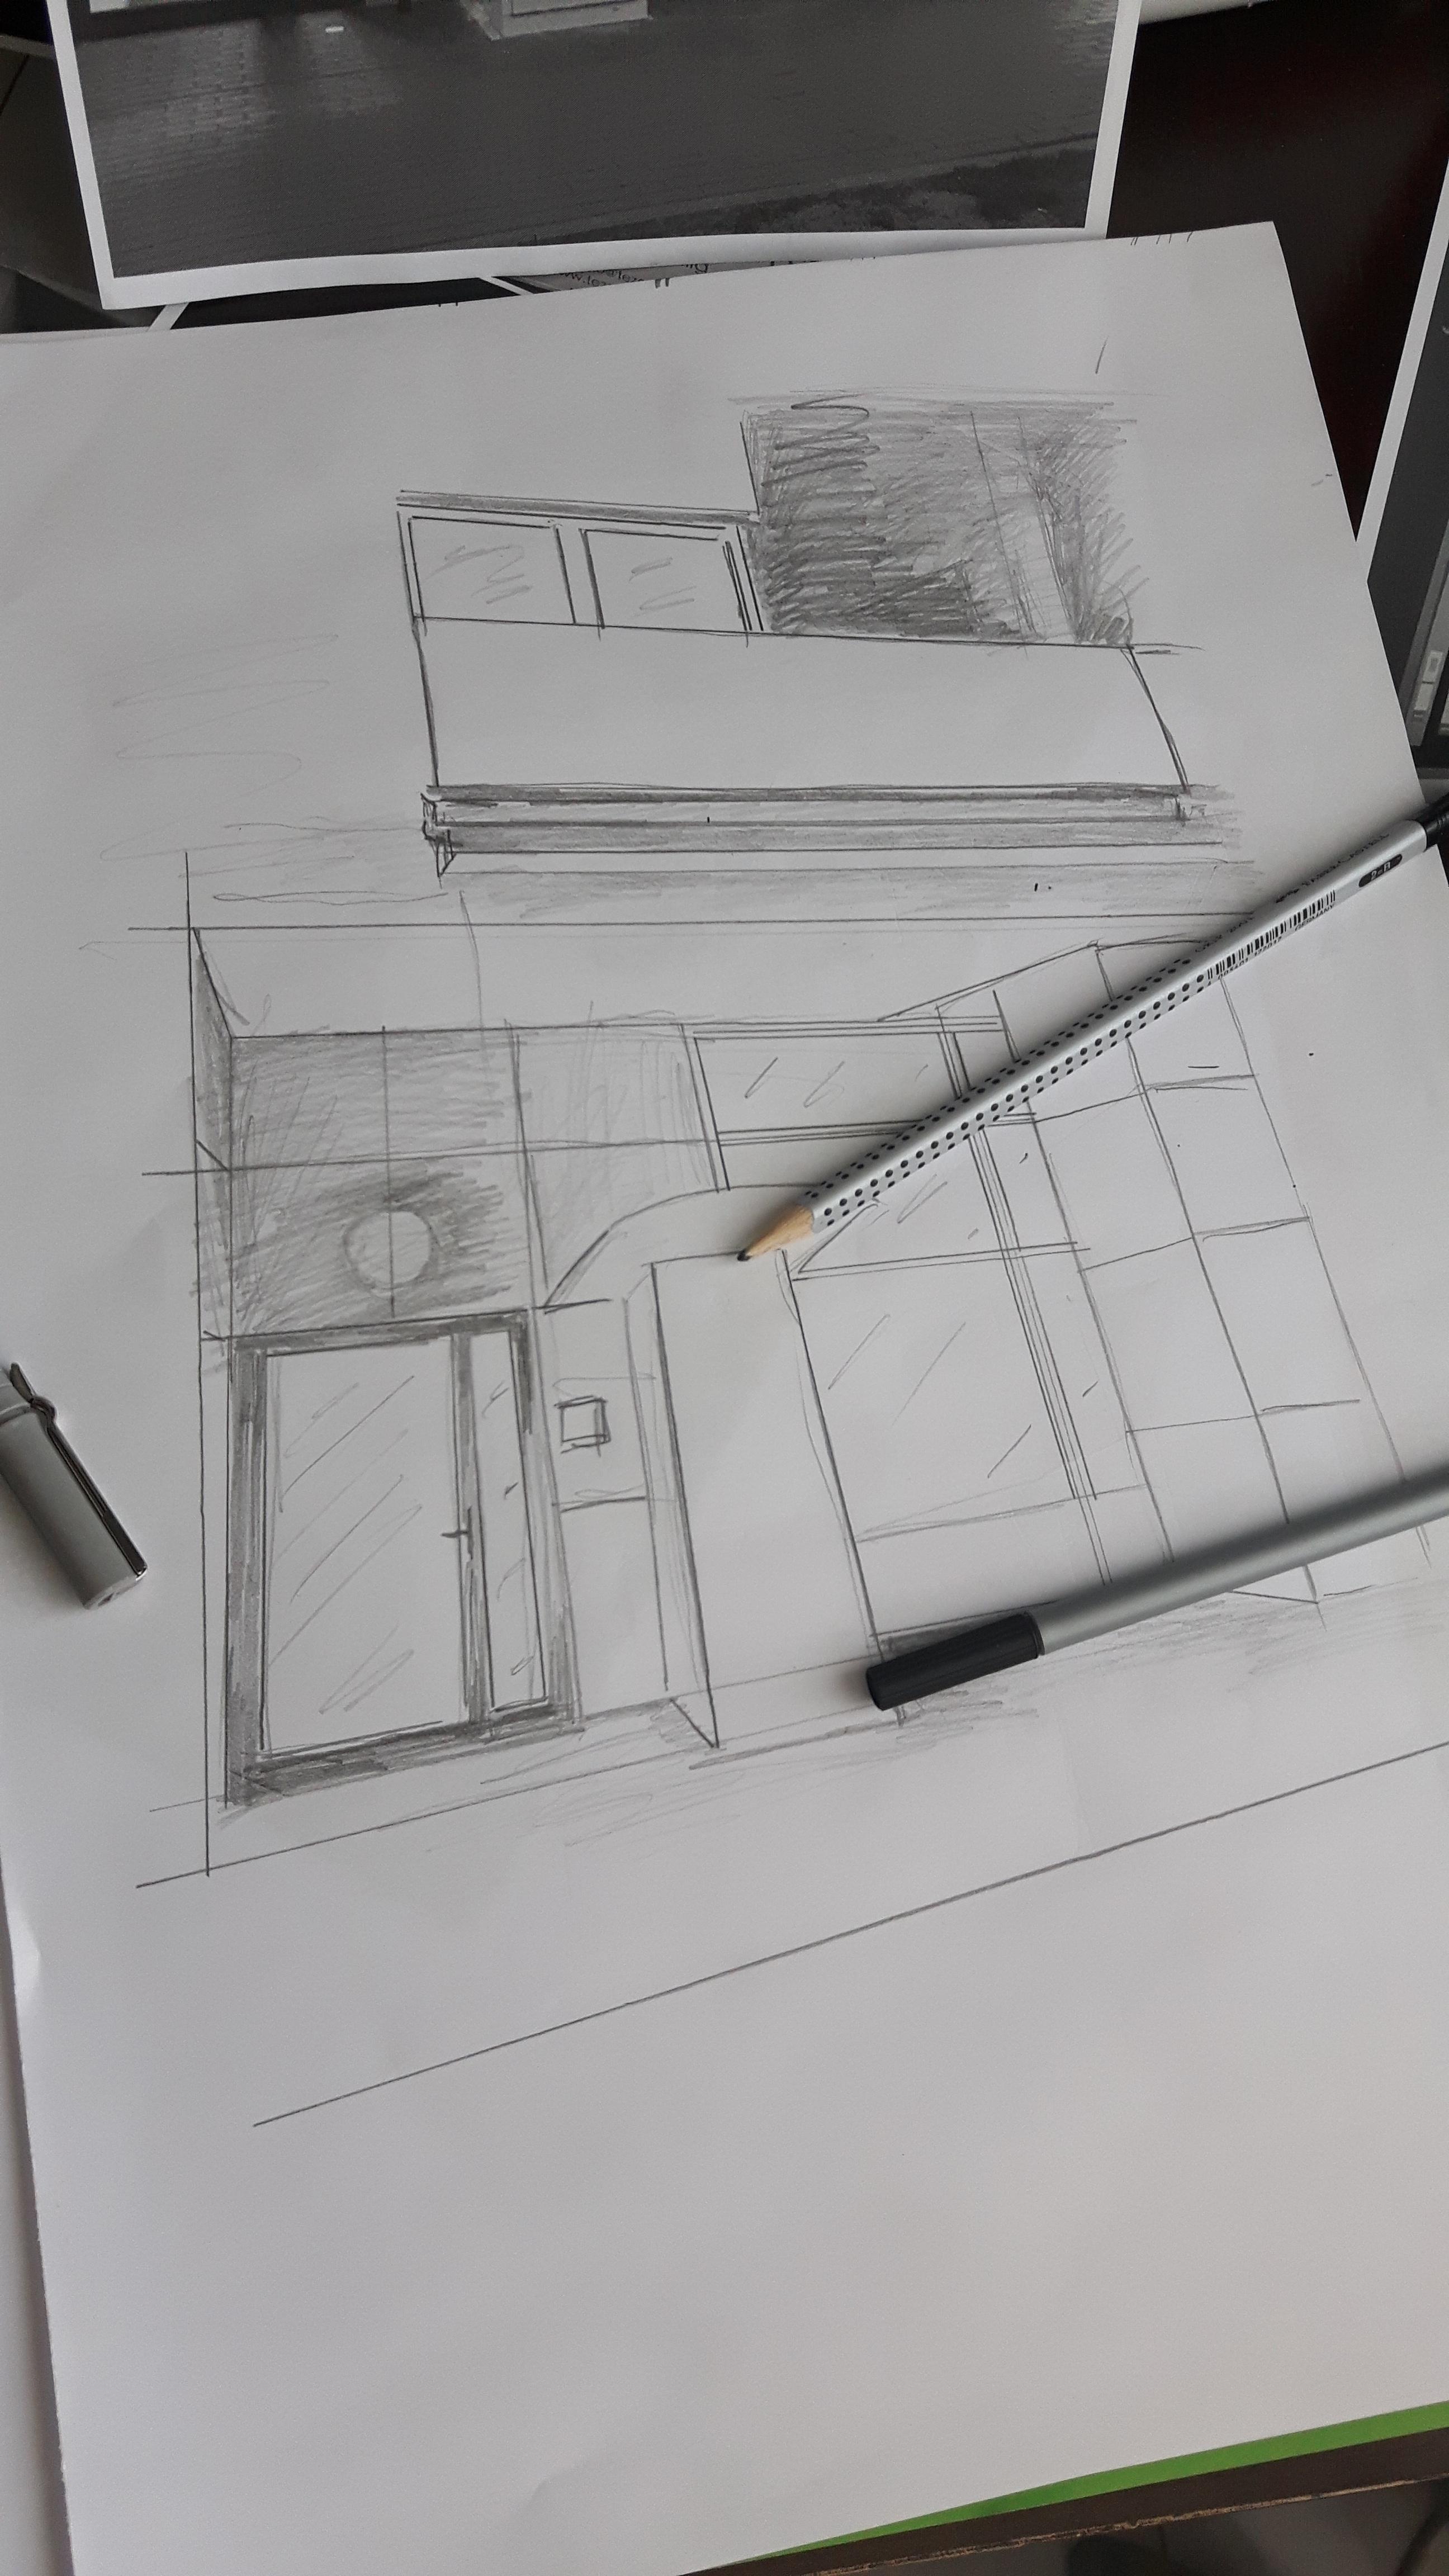 Pensil arsitektur putih seni angka sketsa gambar desain dokumen o weczek model skala